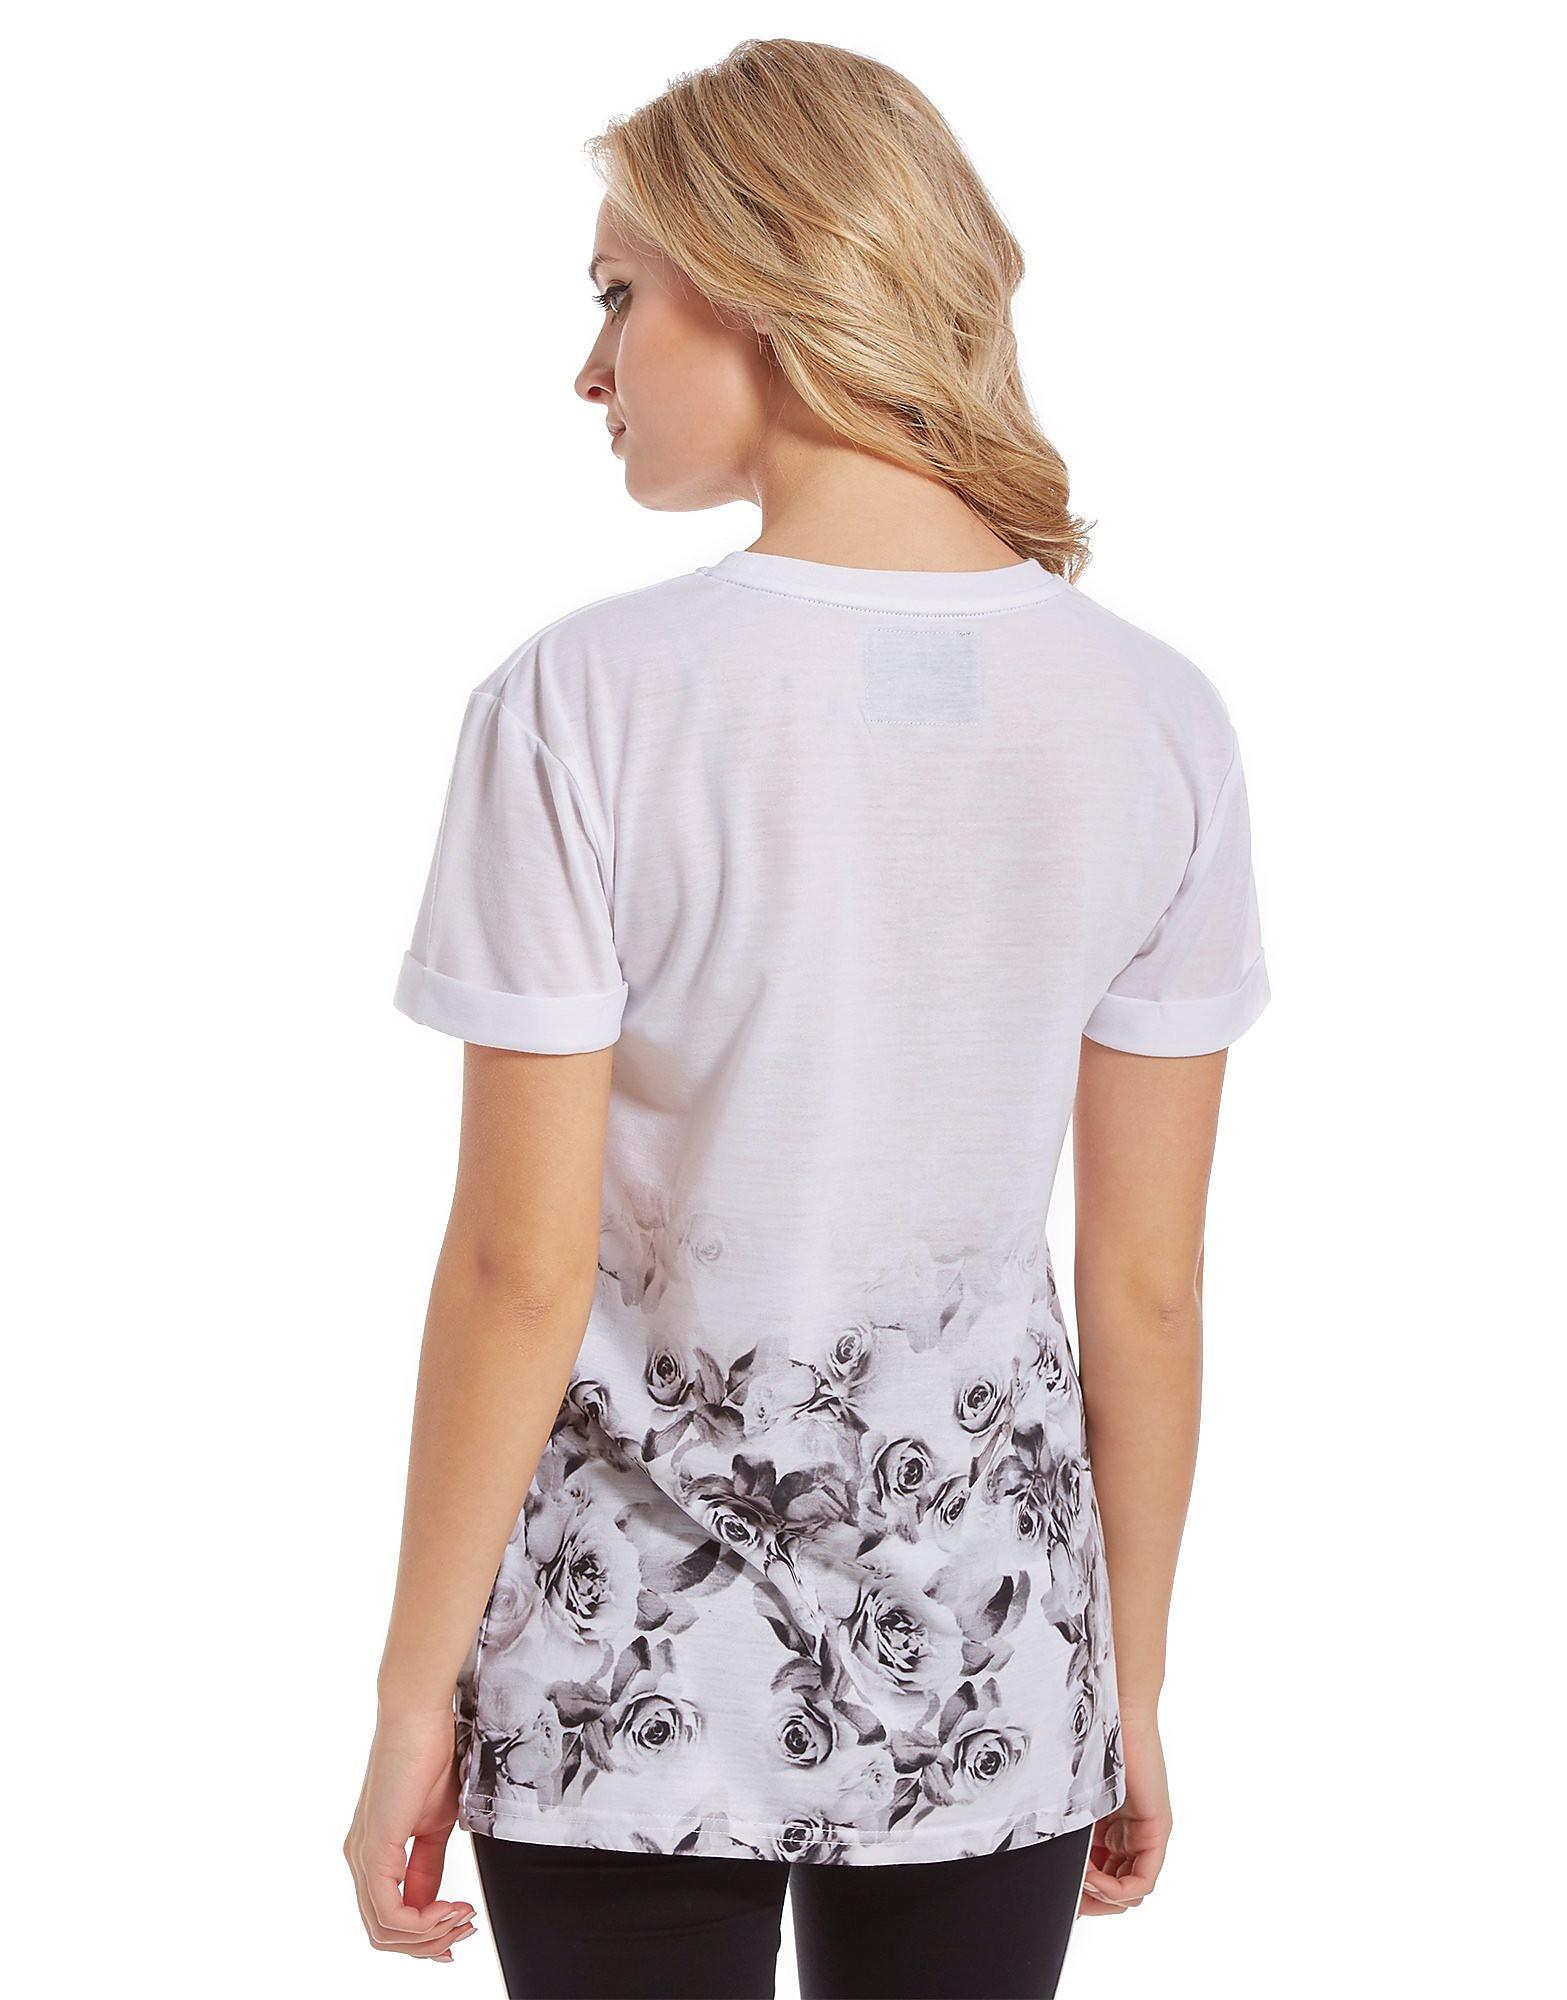 Brookhaven Smokey Floral T-Shirt